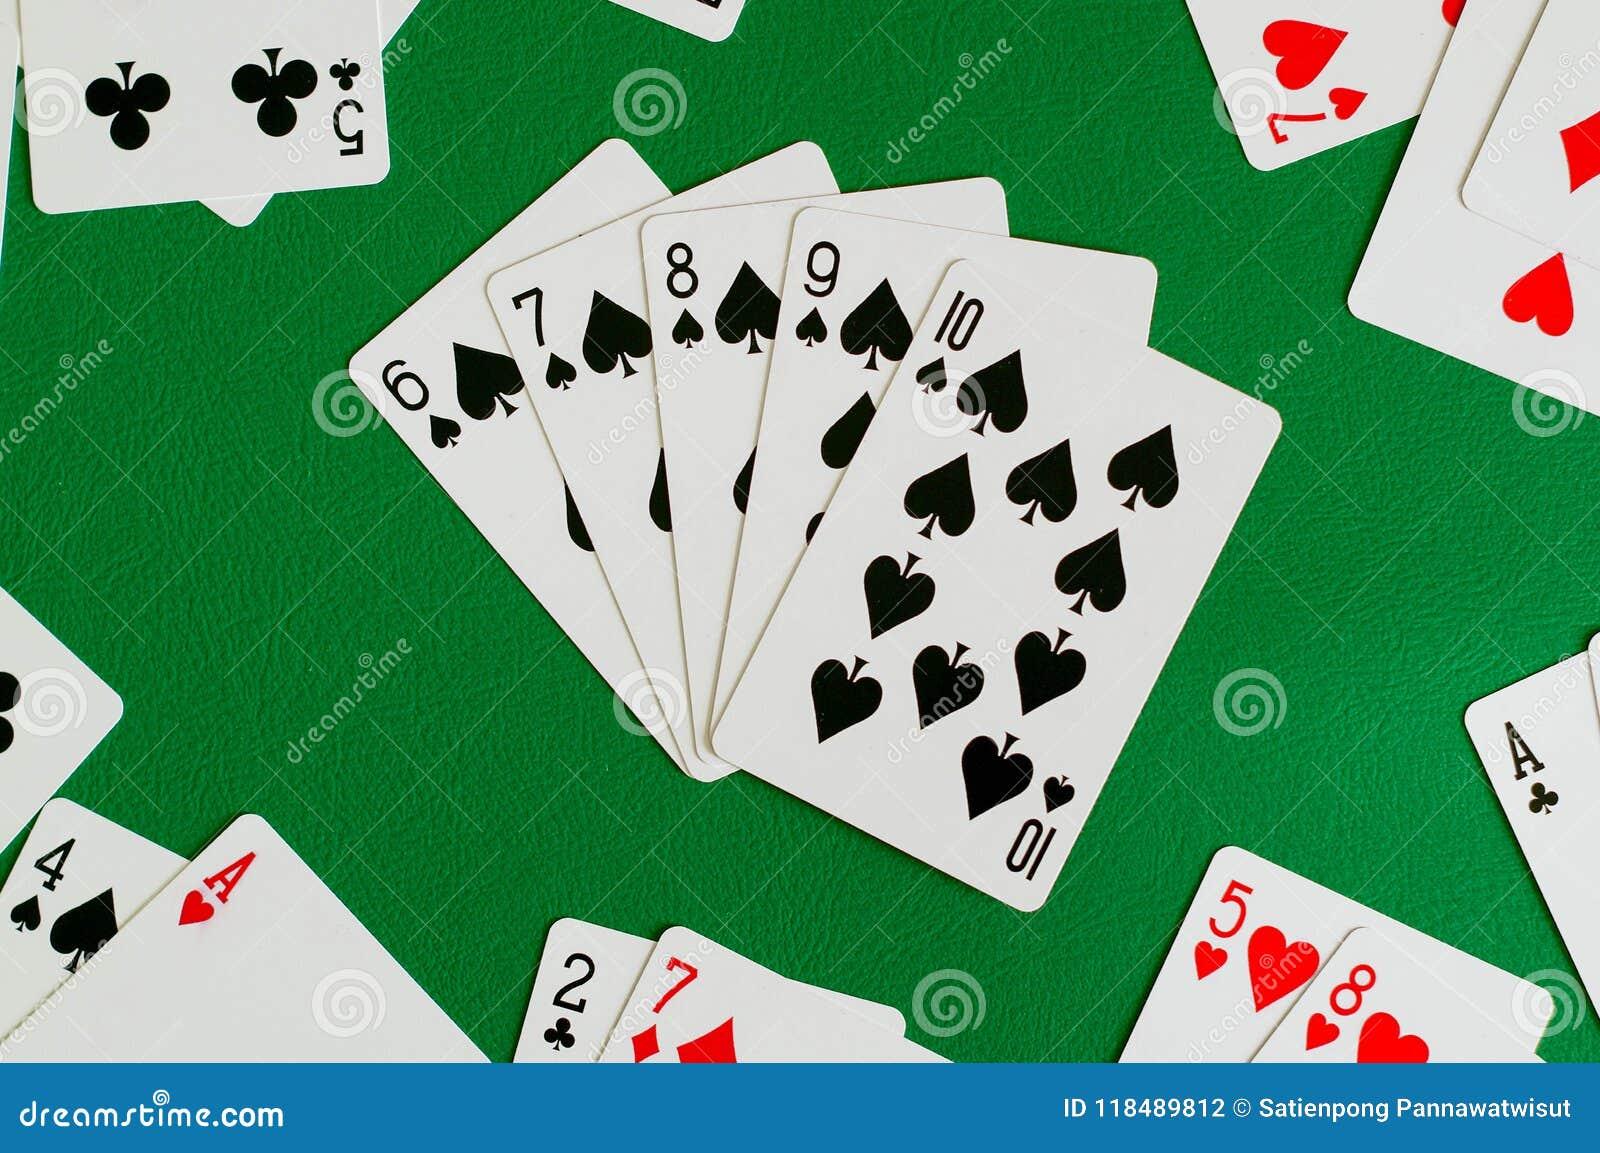 Espada seis del rubor recto siete ocho nueve diez, tarjeta del póker